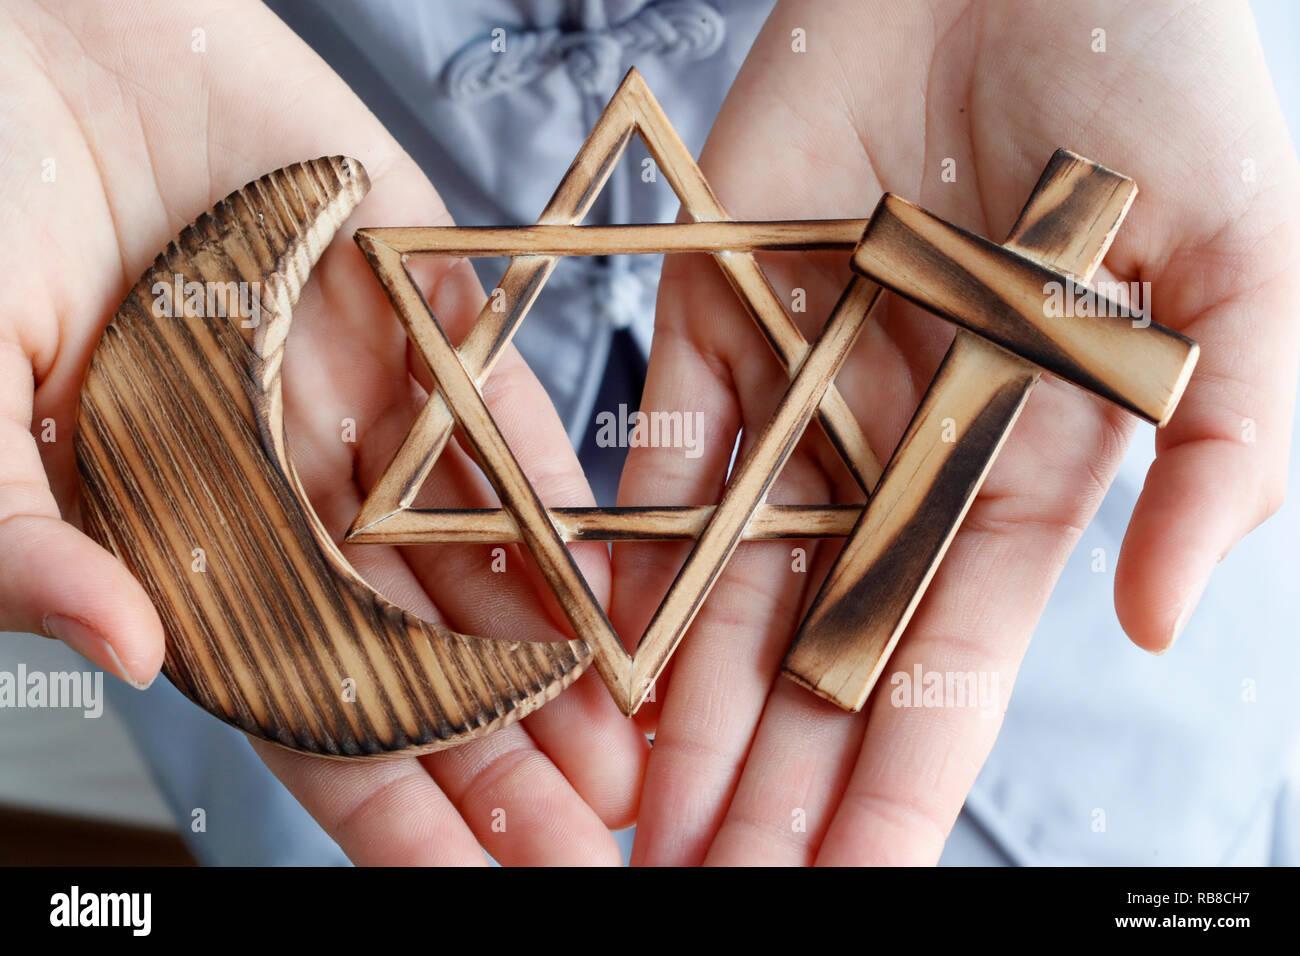 Symboles interreligieux. Christianity, Islam, Judaism 3 monotheistic religions. Jewish Star, Cross and Crescent : Interreligious symbols in hands. Stock Photo